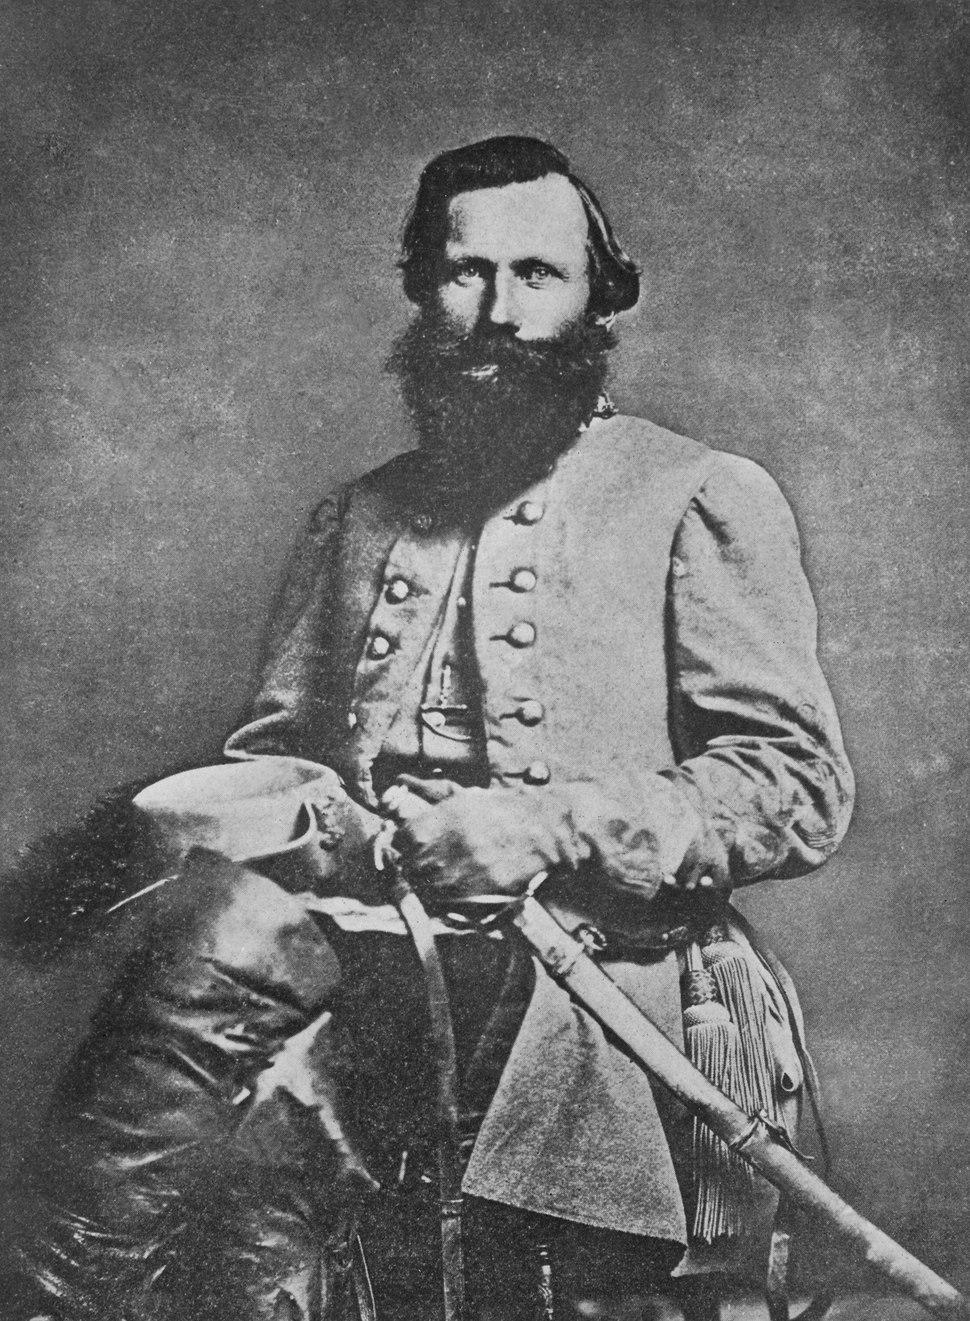 General %22Jeb%22 Stuart, Confederate States of America, 1863, 1961 - 1986 - NARA - 518135